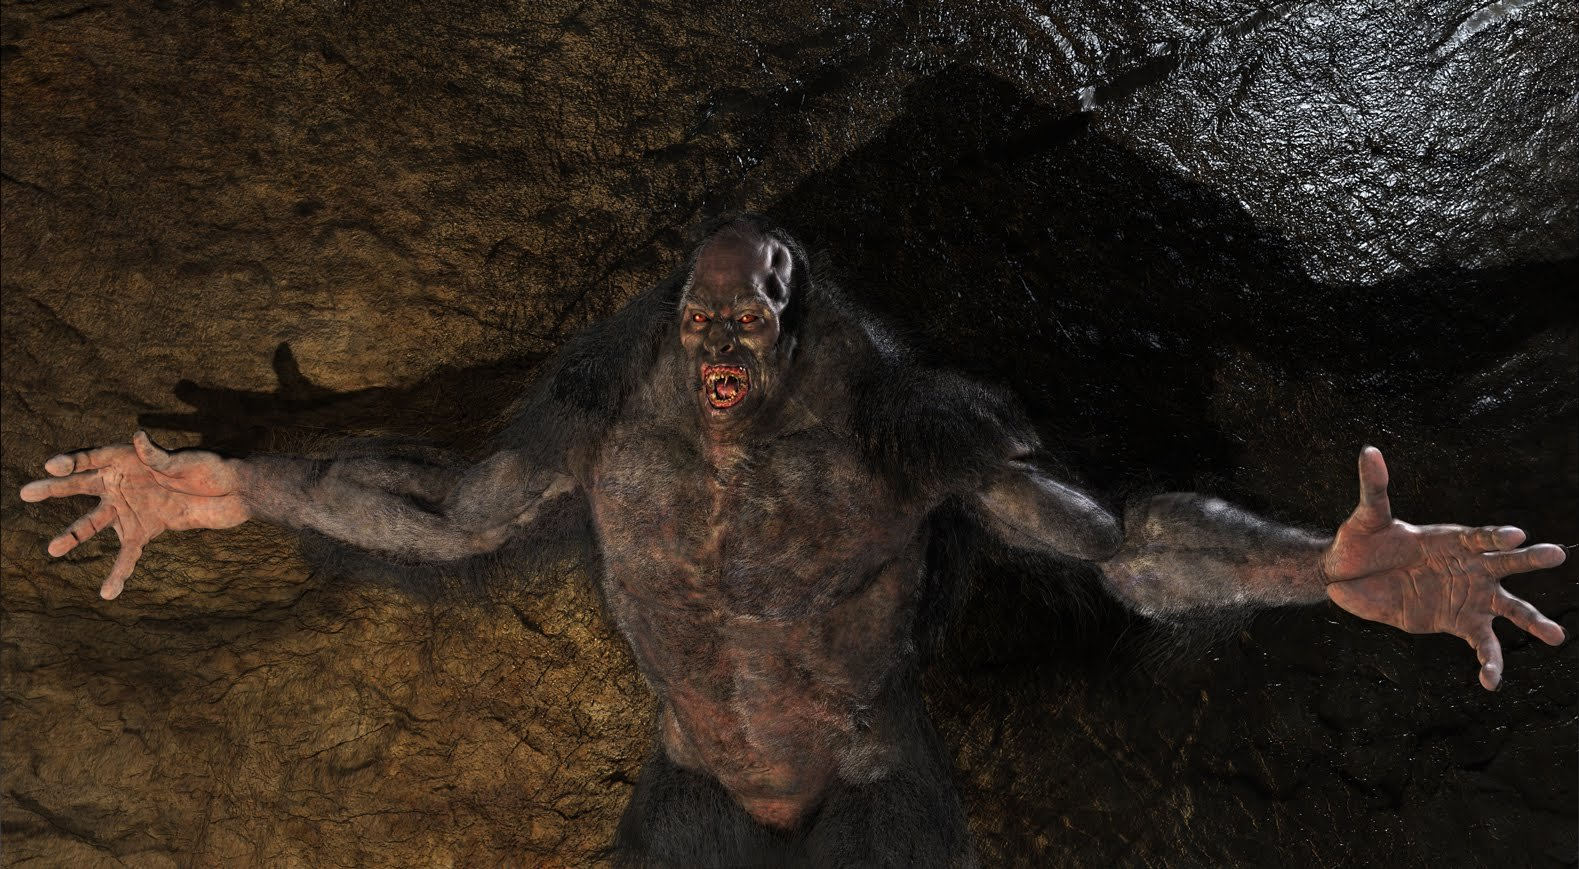 Cavetroll danielgarcia